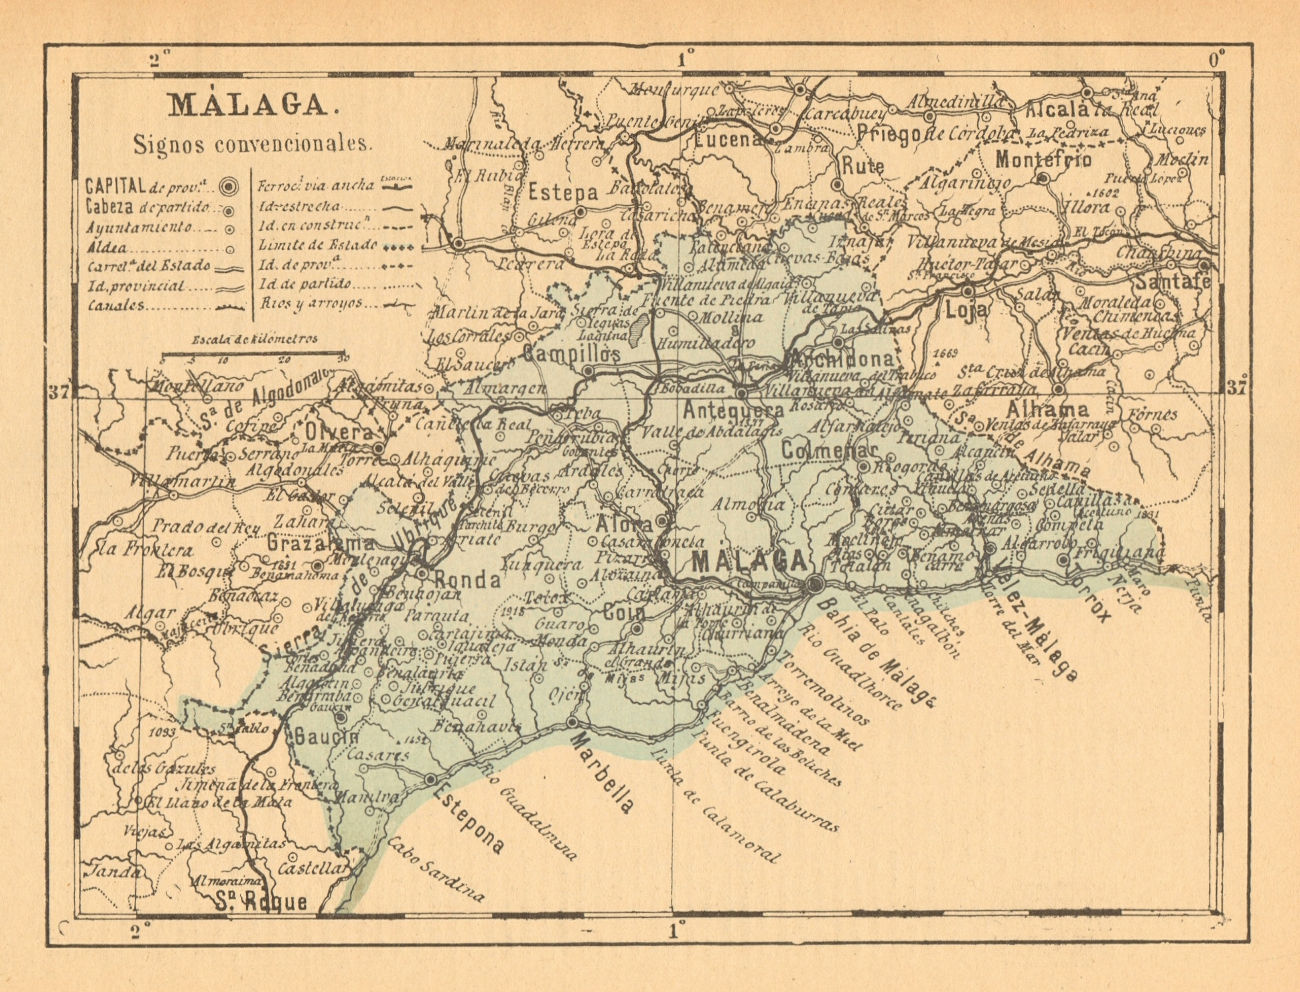 MÁLAGA. Malaga. Andalucia. Mapa antiguo de la provincia 1914 old antique